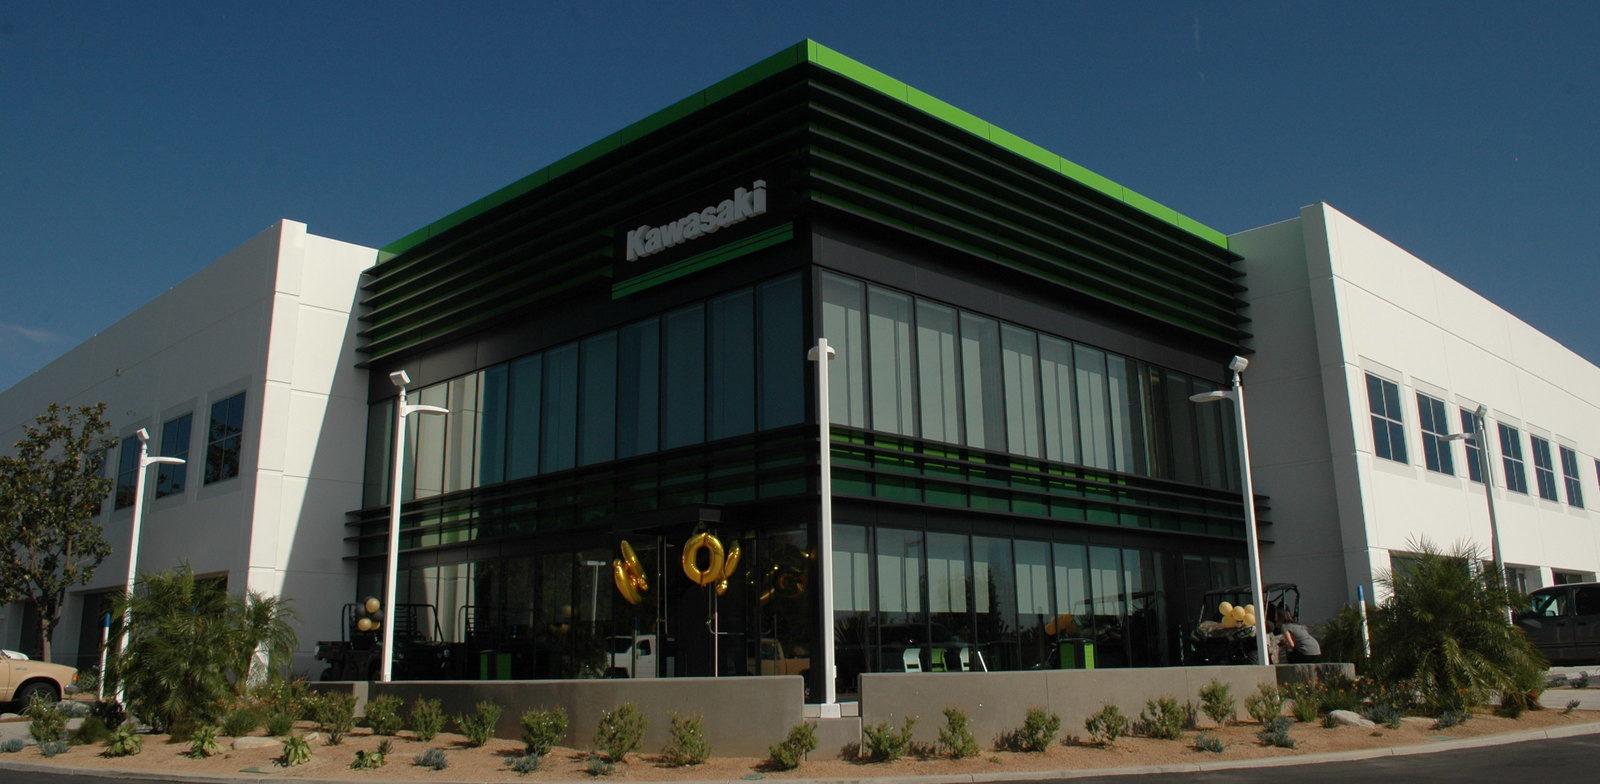 A view of a Kawasaki Motors building in the USA